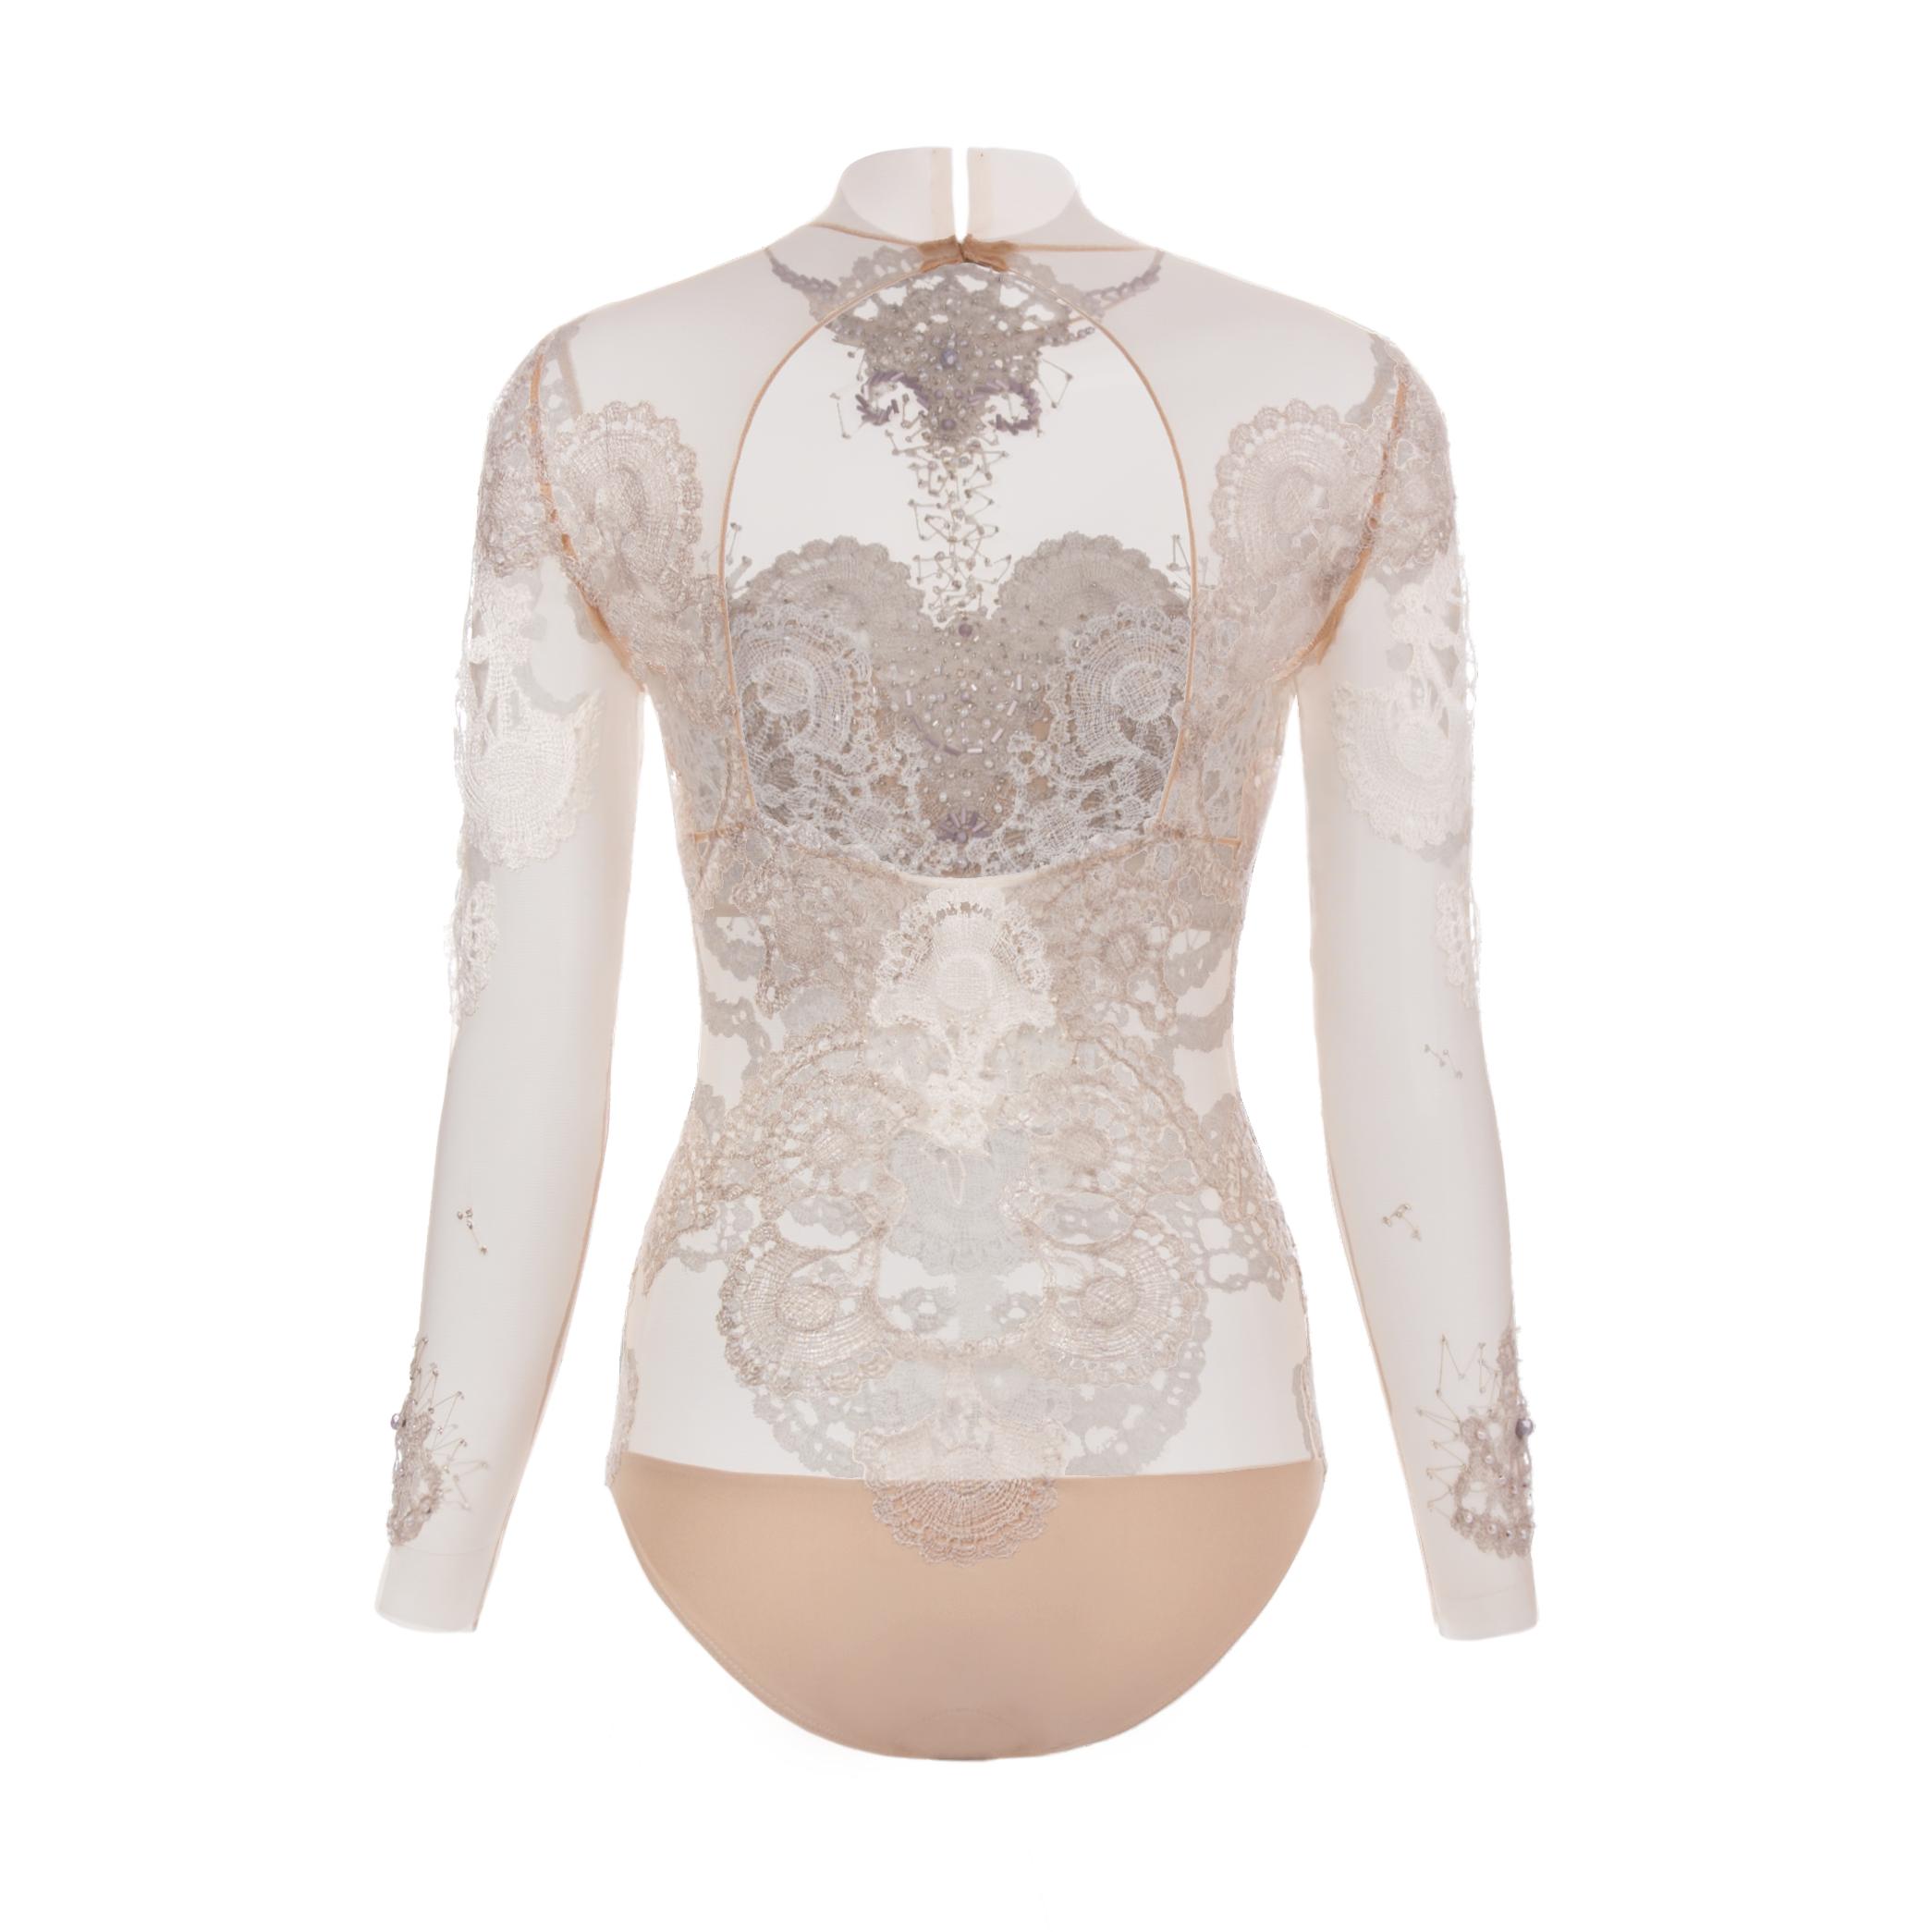 72e1d20ffb Zoom in. KV Couture by Kristina Viirpalu. Cream White Bodysuit